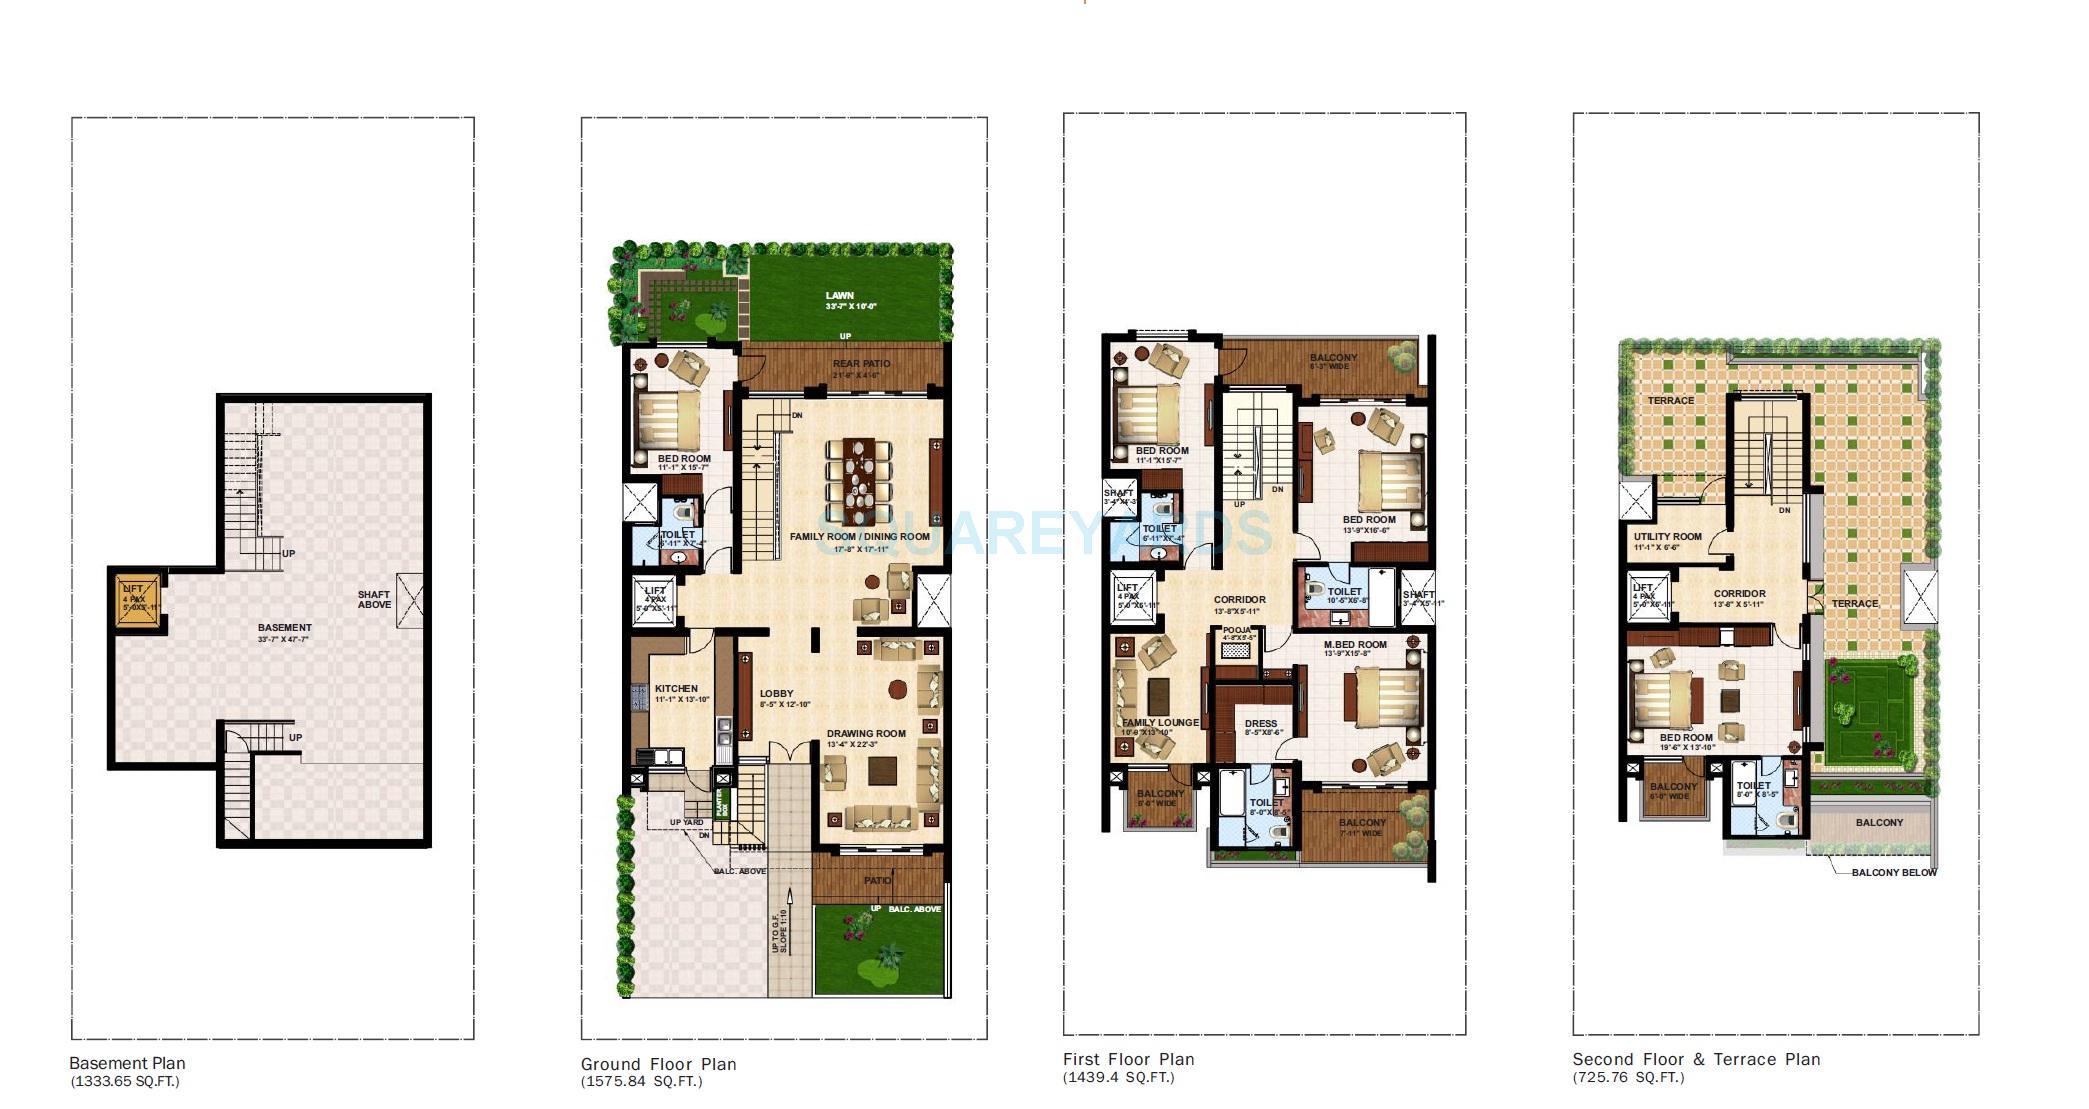 5 Bhk 5000 Sq Ft Villaincl Basement For Sale In Anant Raj Estate The Villas At Rs 5 30 Cr Gurgaon